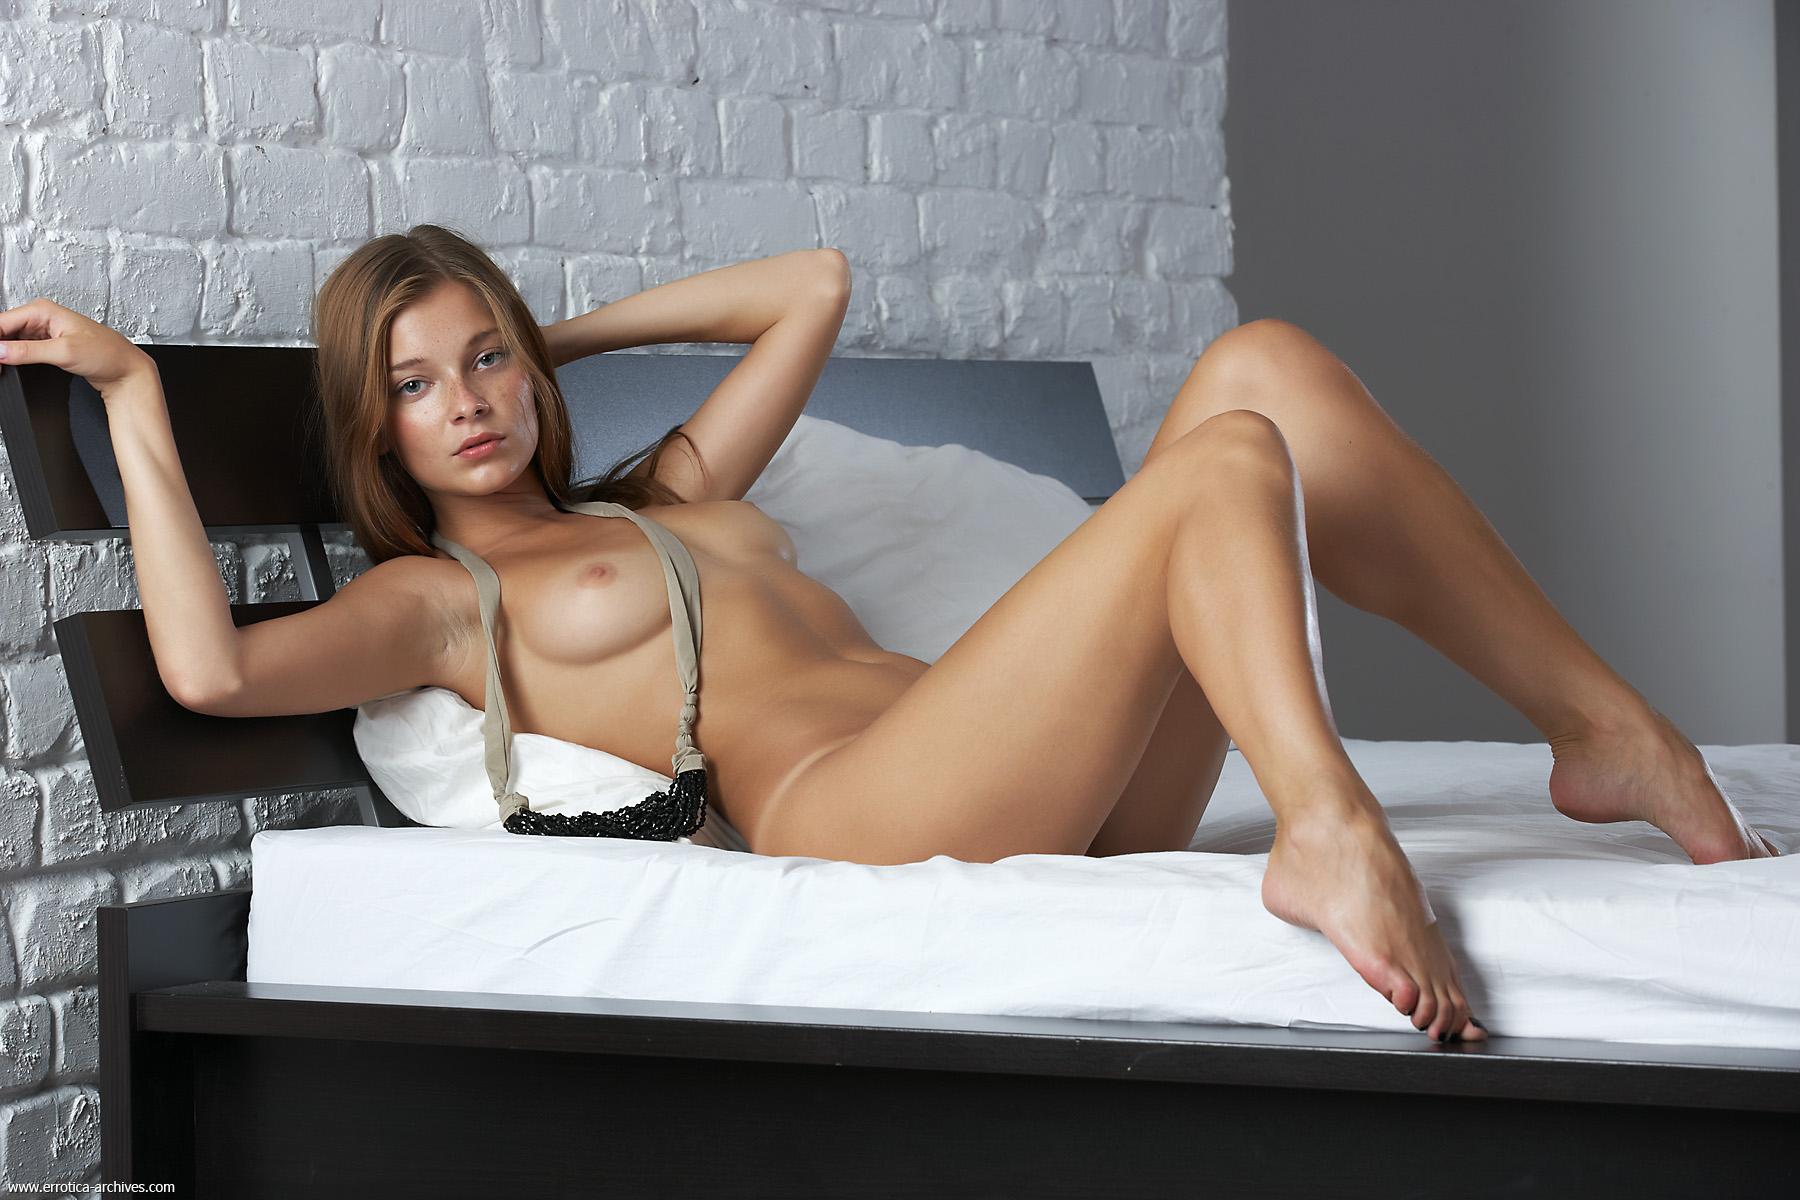 Softcore nude erotic women